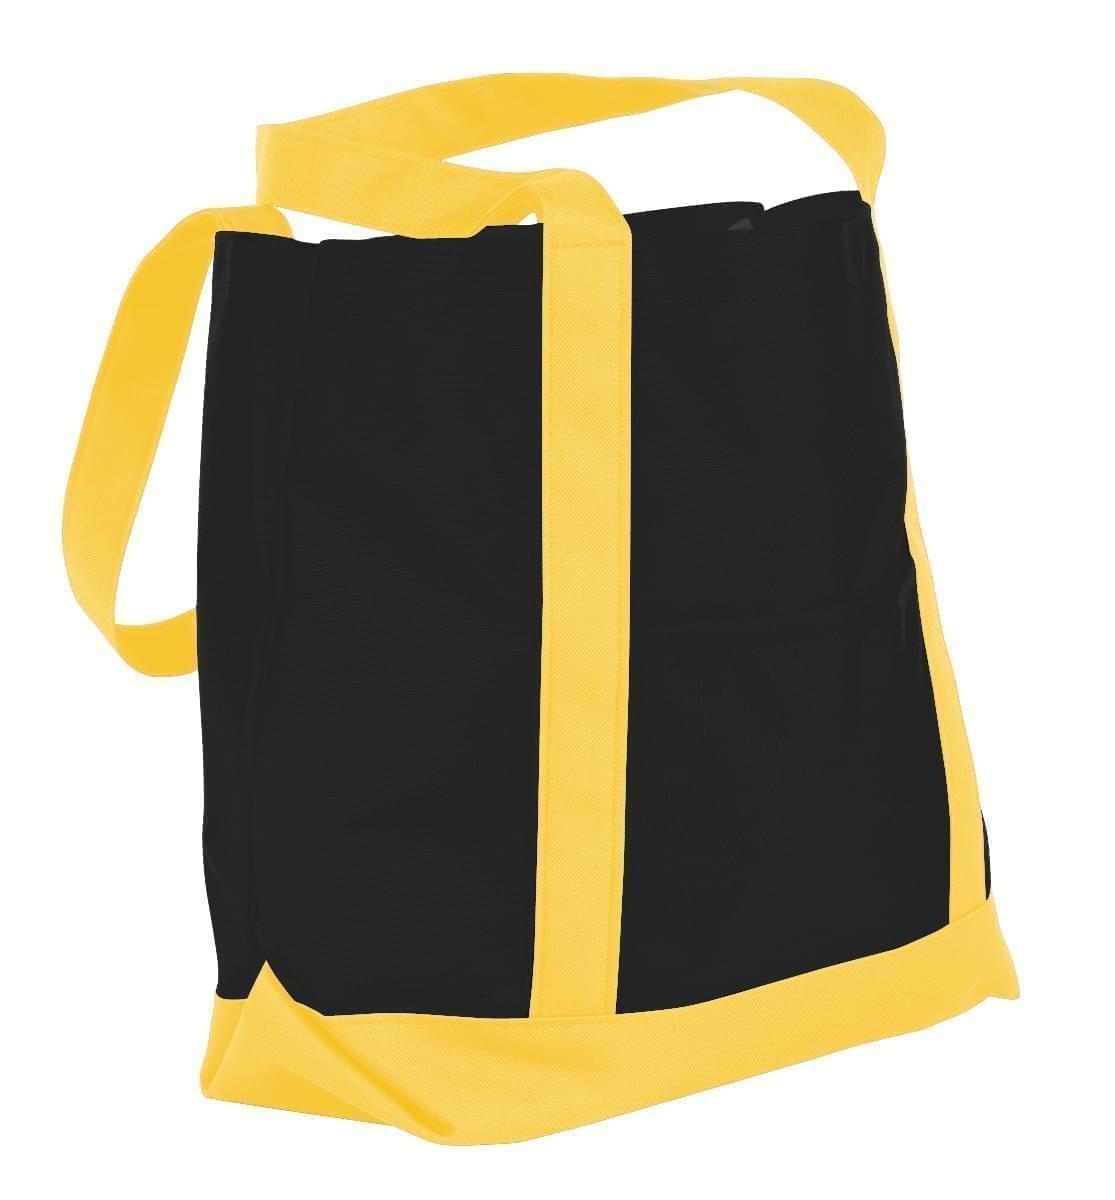 USA Made Canvas Fashion Tote Bags, Black-Gold, XAACL1UAHQ